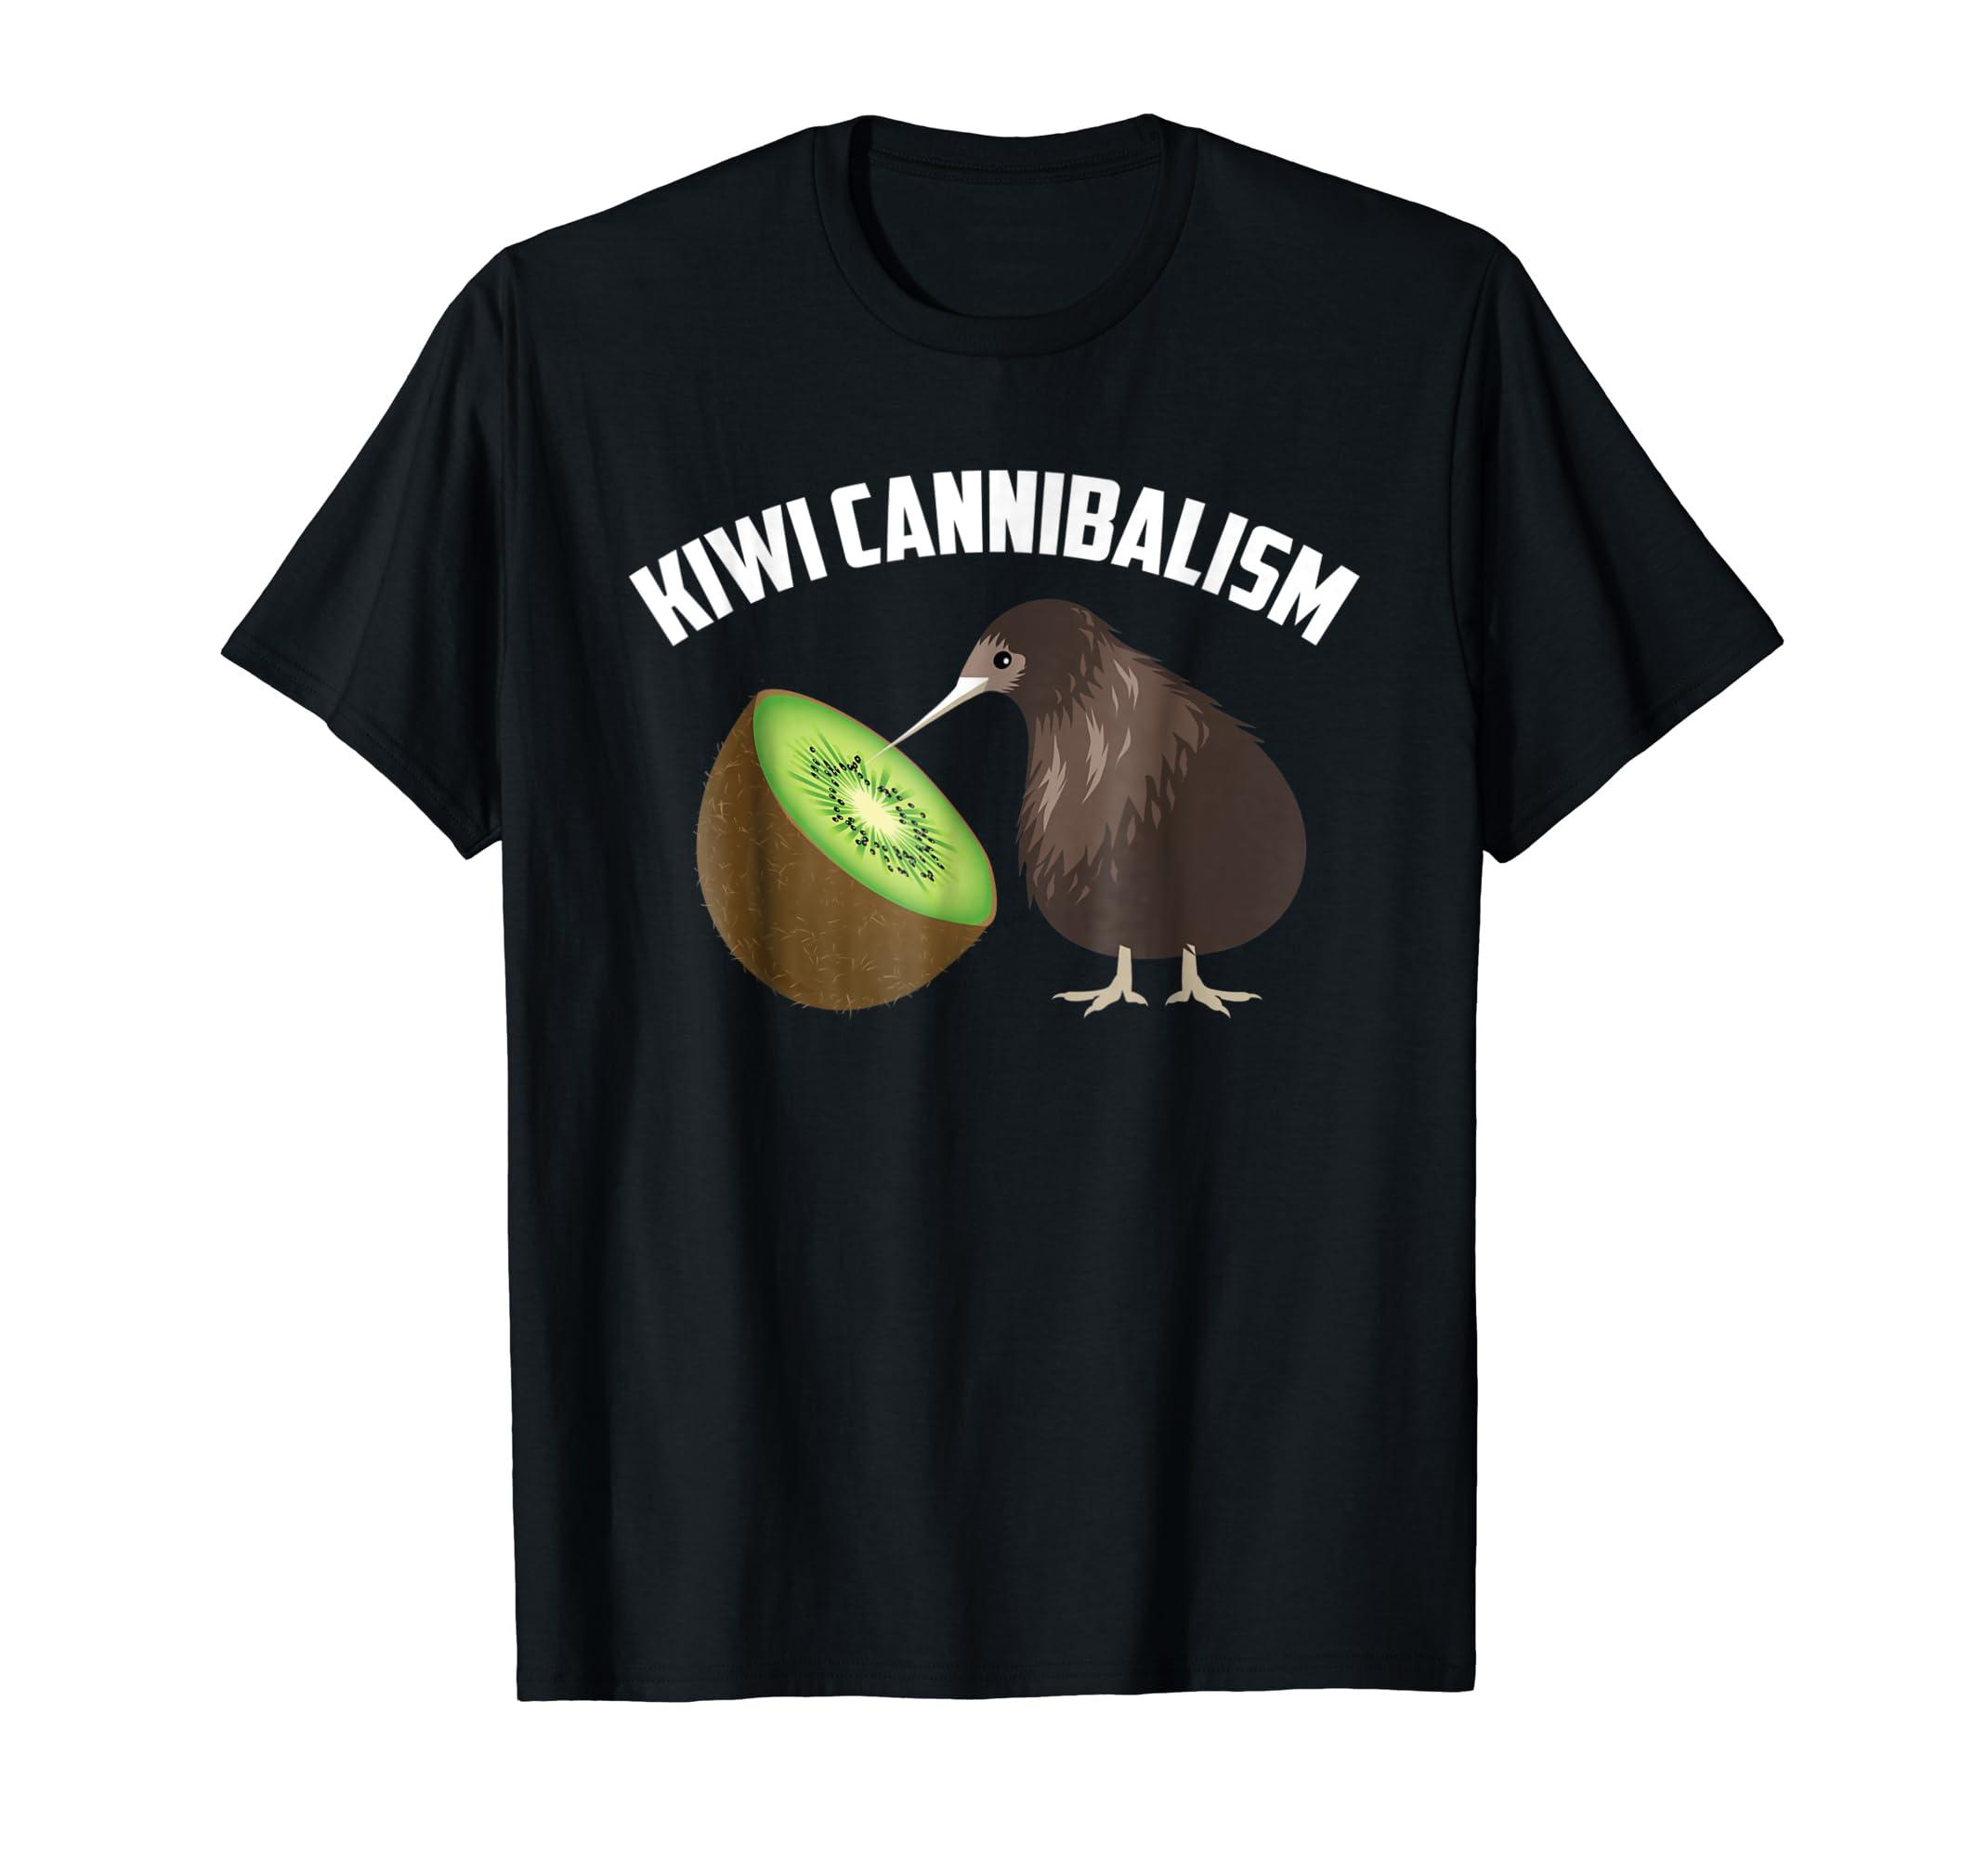 Amazon.com  Kiwi Cannibalism Shirt   Cute Cannibalistic Bird Tee Gift   Clothing f16a13cbfab